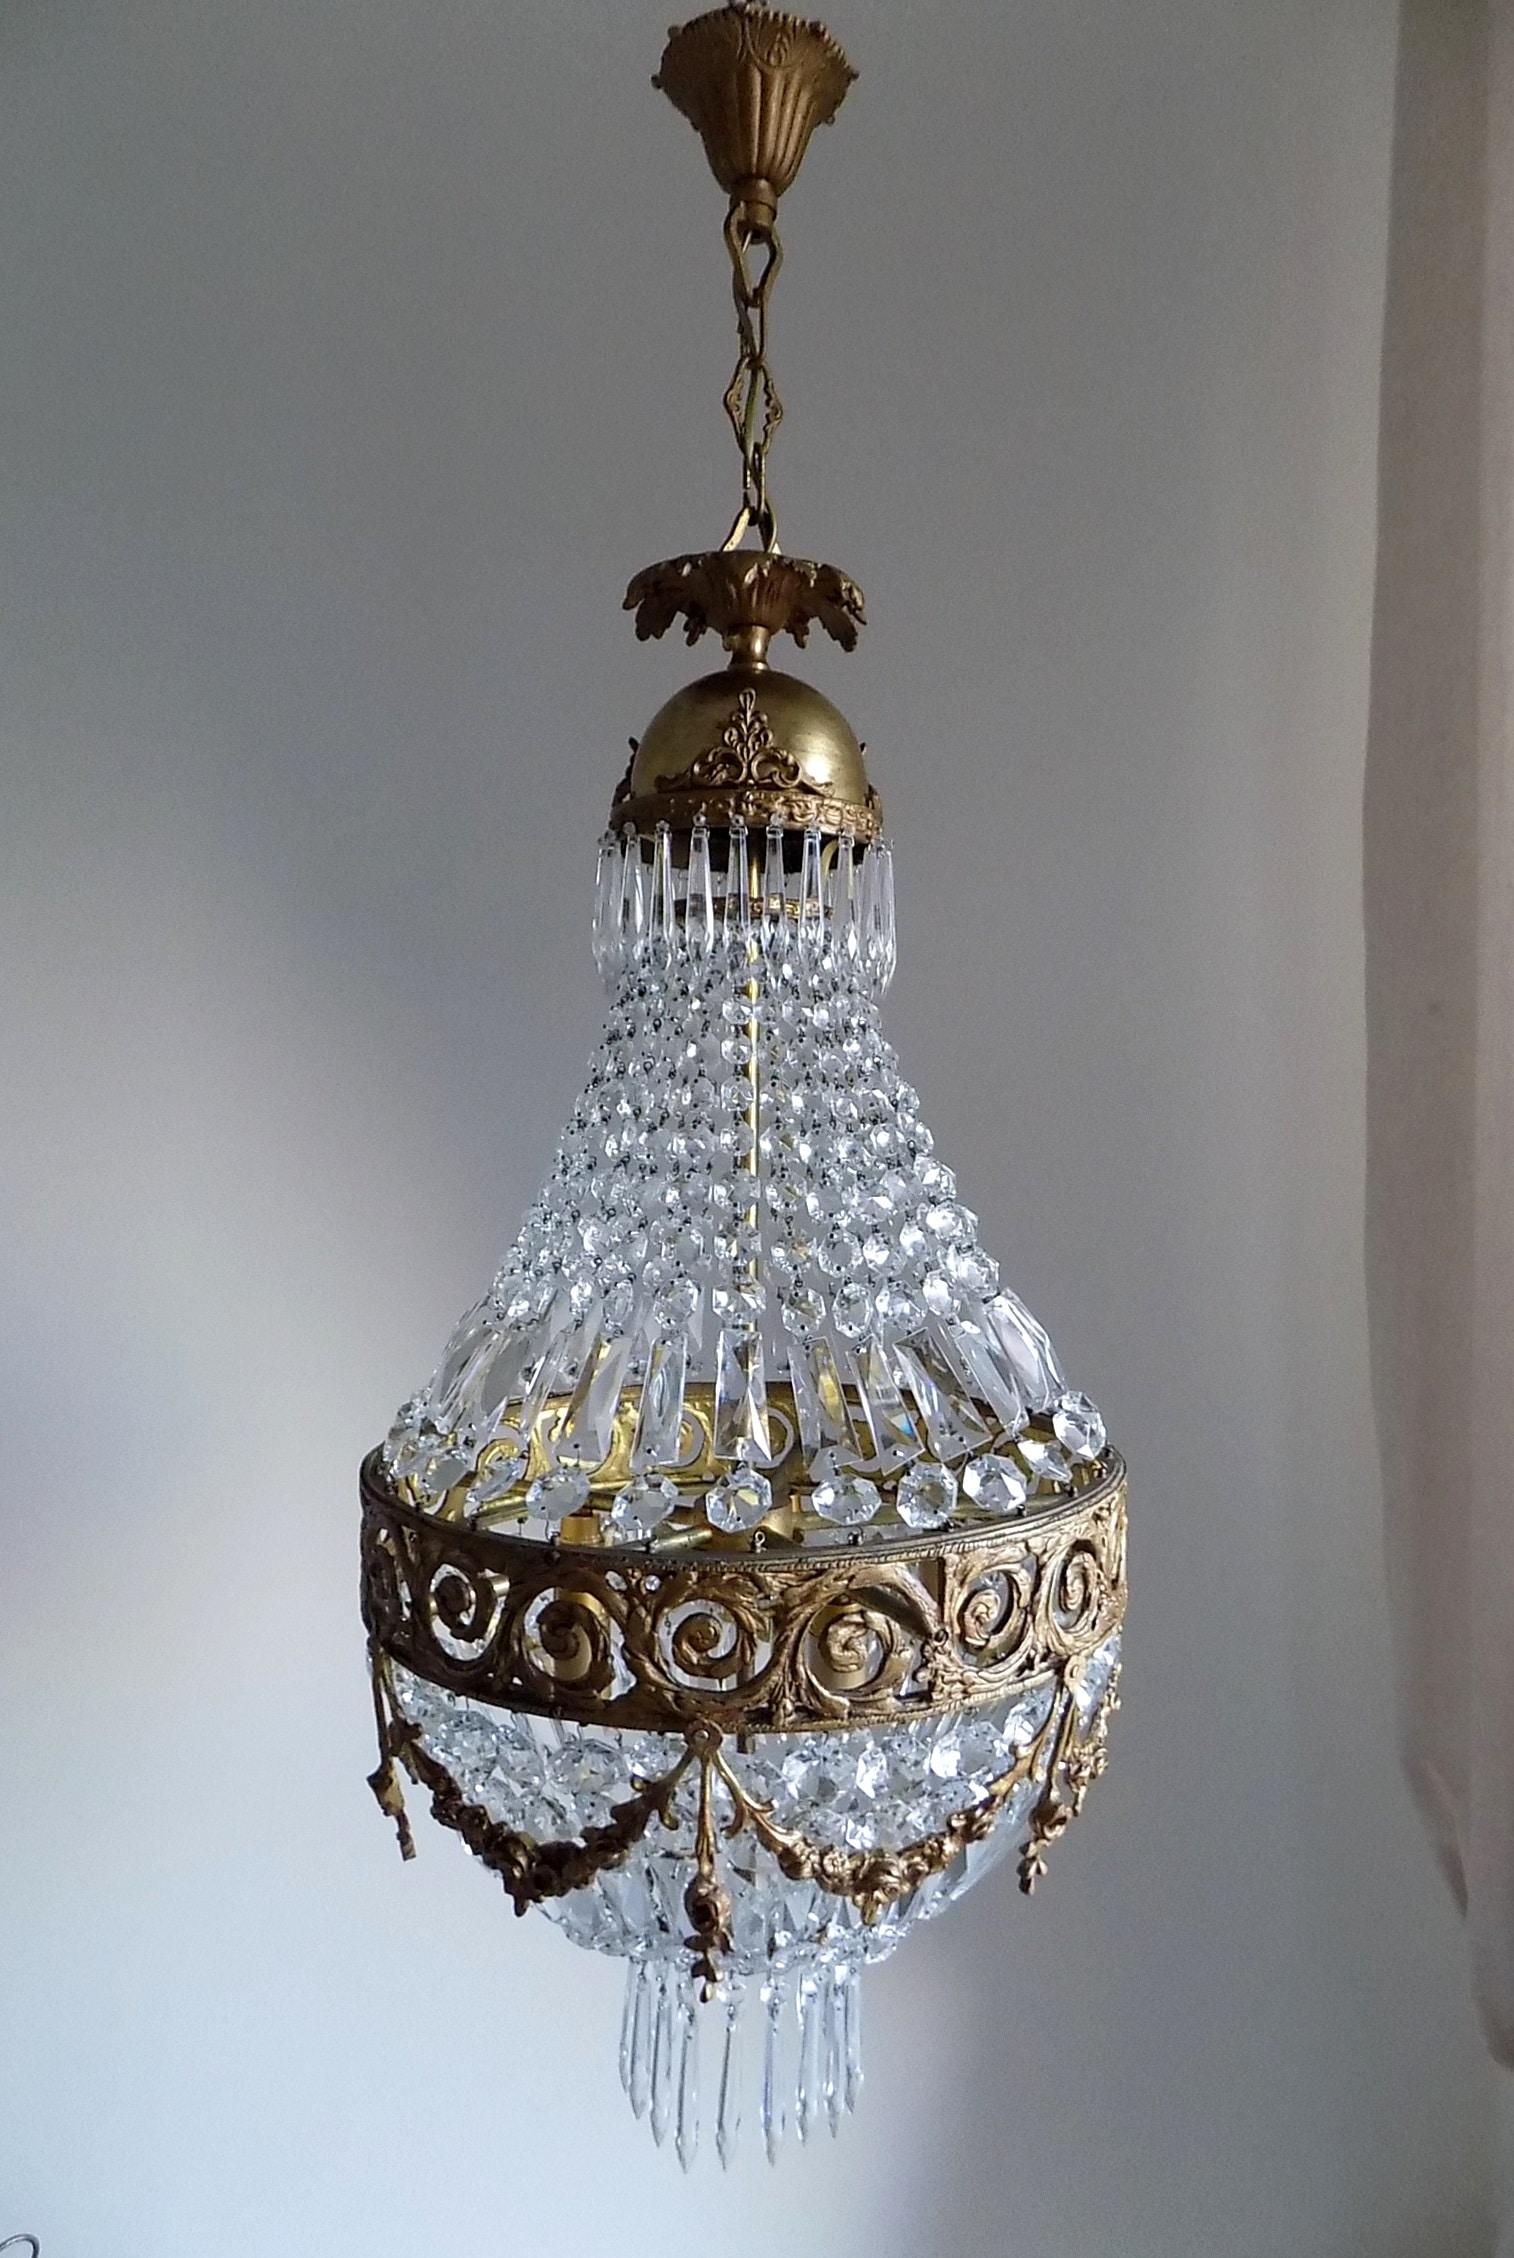 Antique bronze empire style chandelier